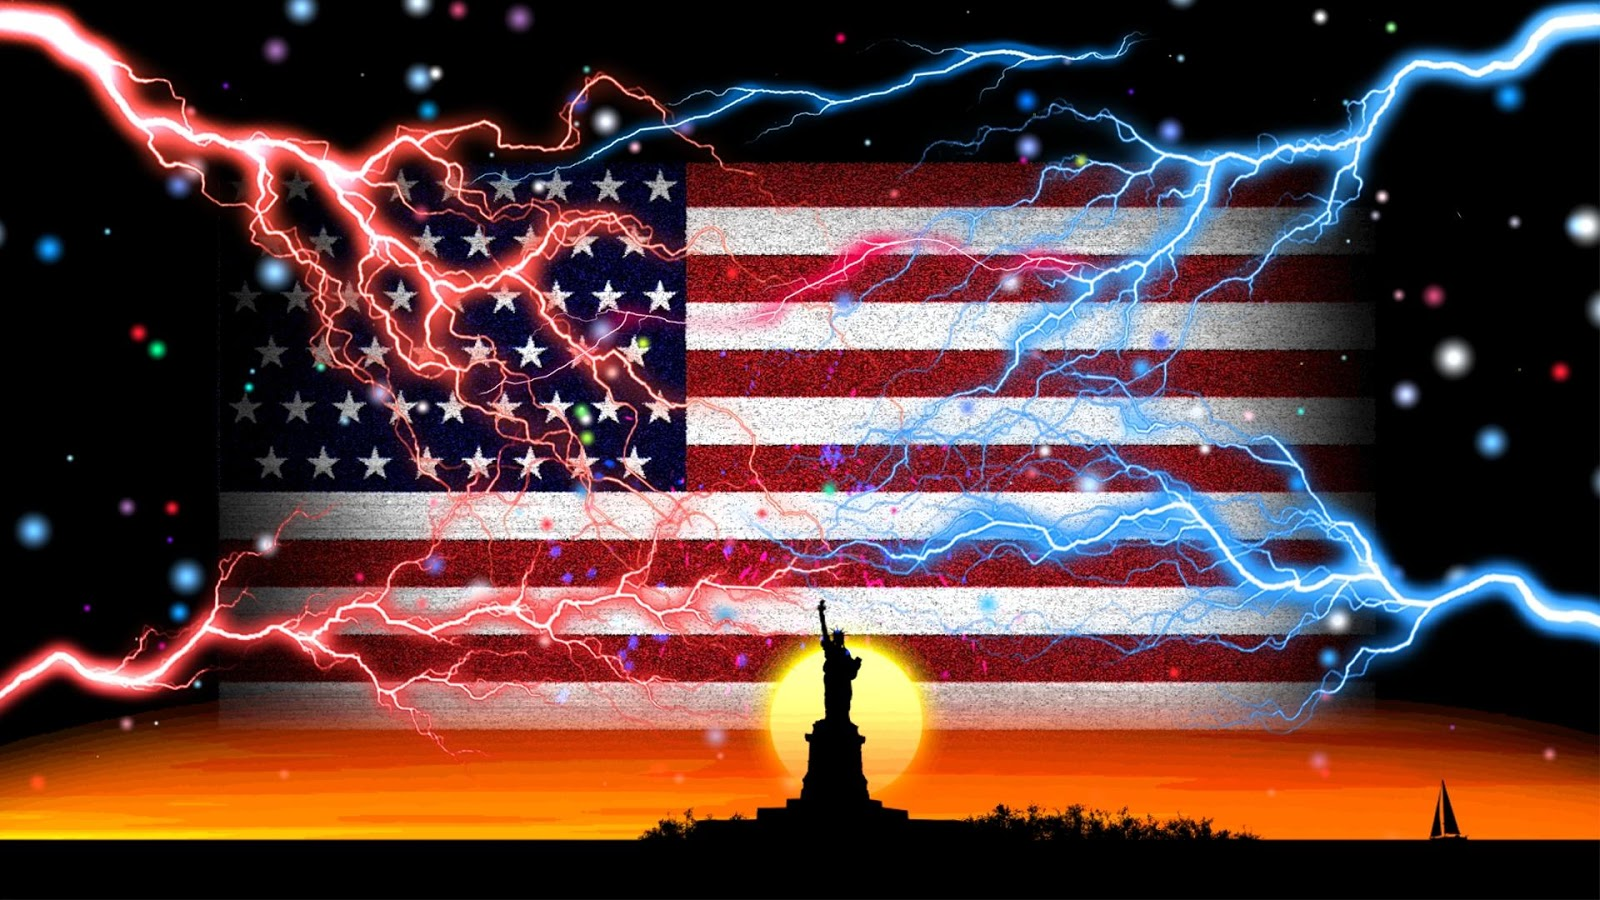 Usa Flag Wallpaper 3d 903816 Hd Wallpaper Backgrounds Download